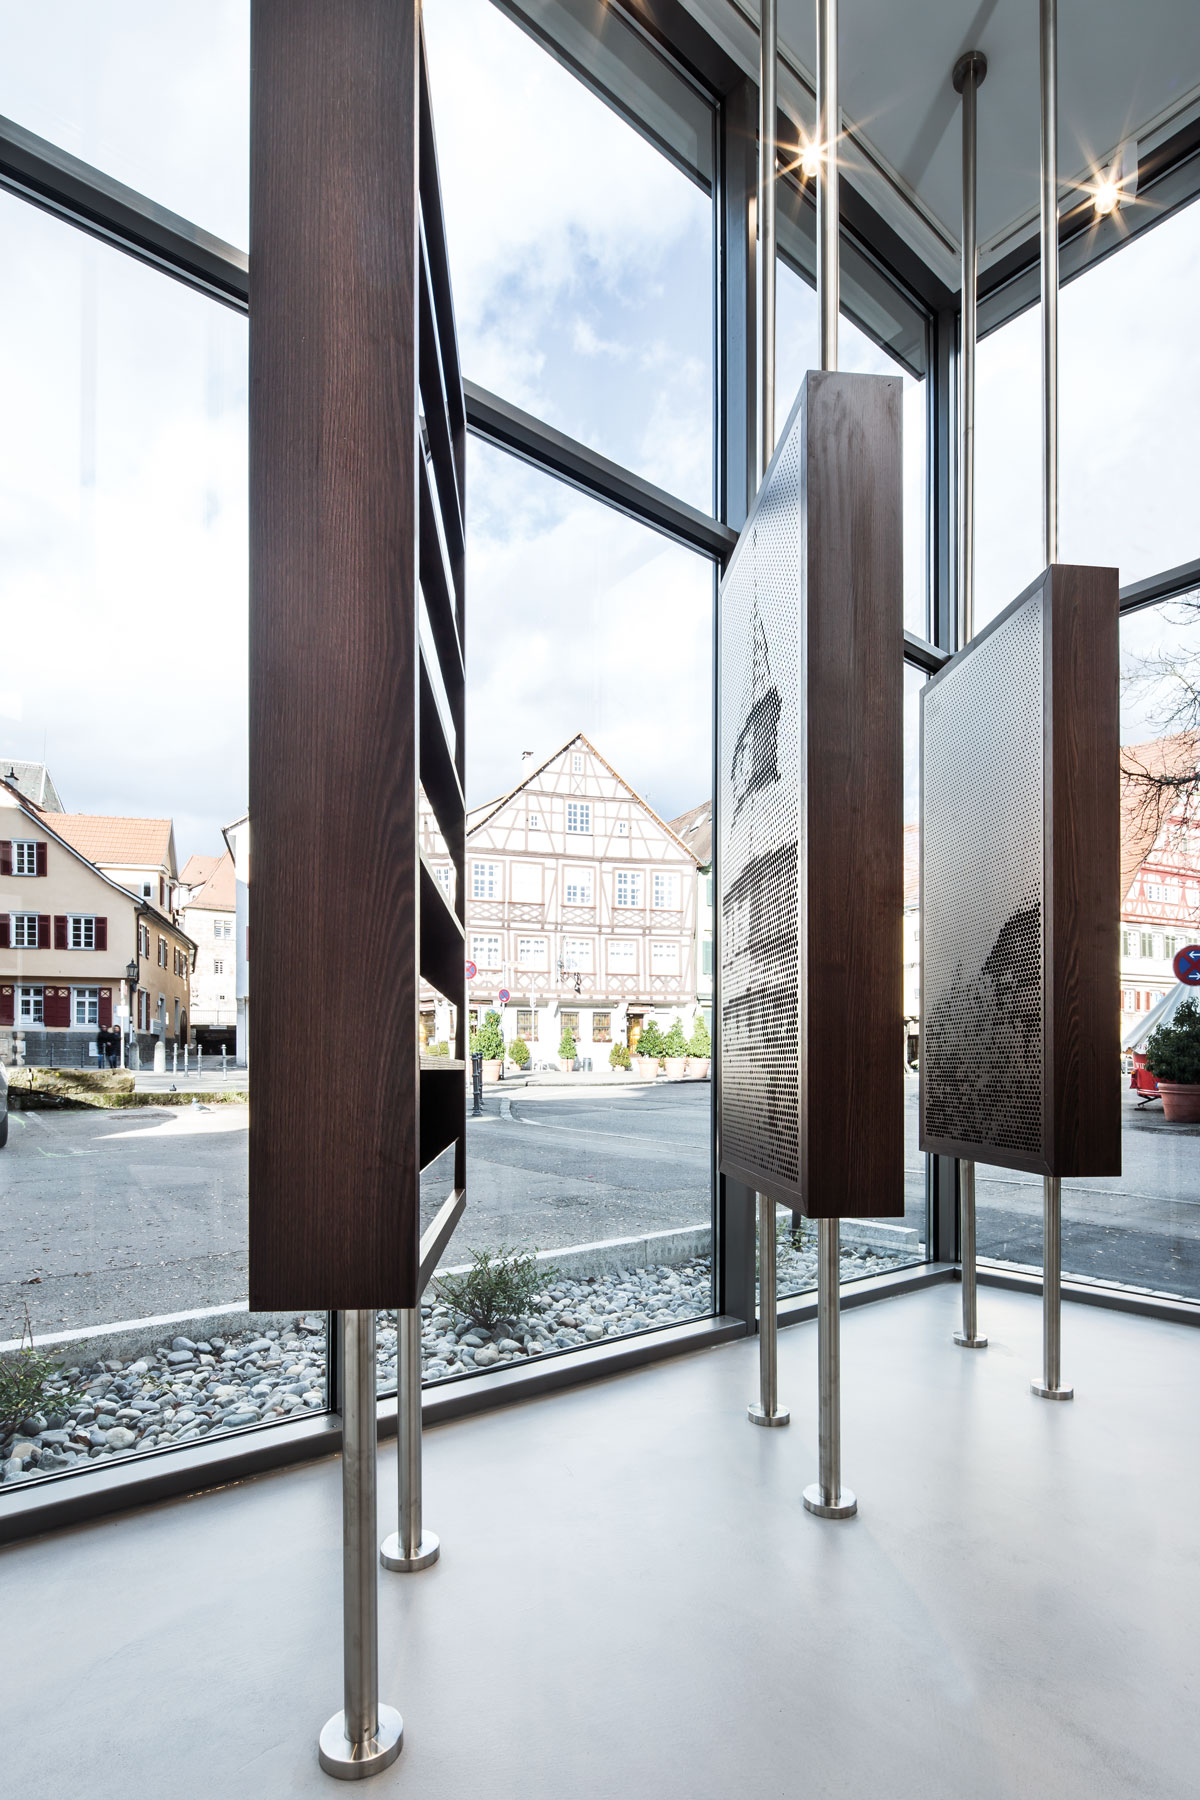 Stadtinformation Esslingen, Lochblechgrafik und Informationsregal